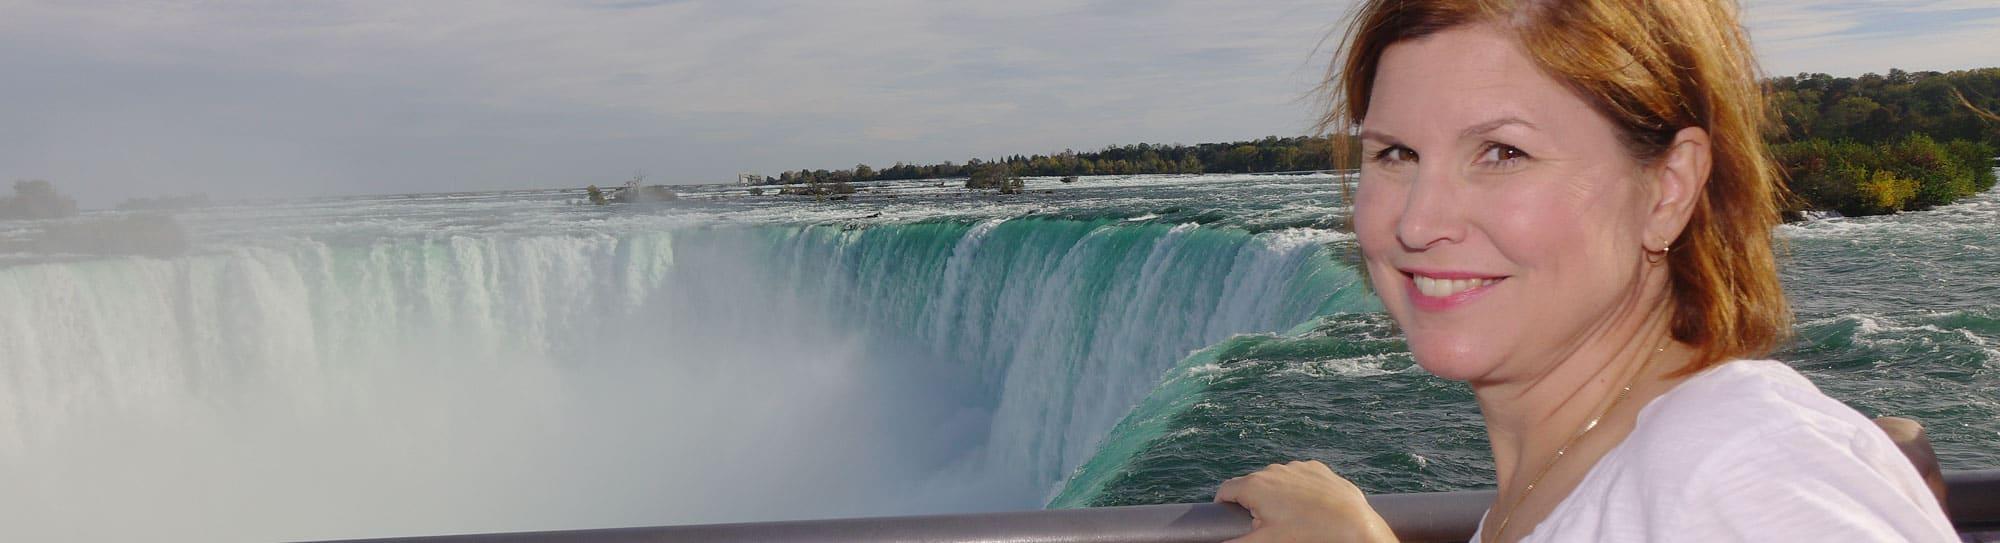 niagara falls canada tour photo